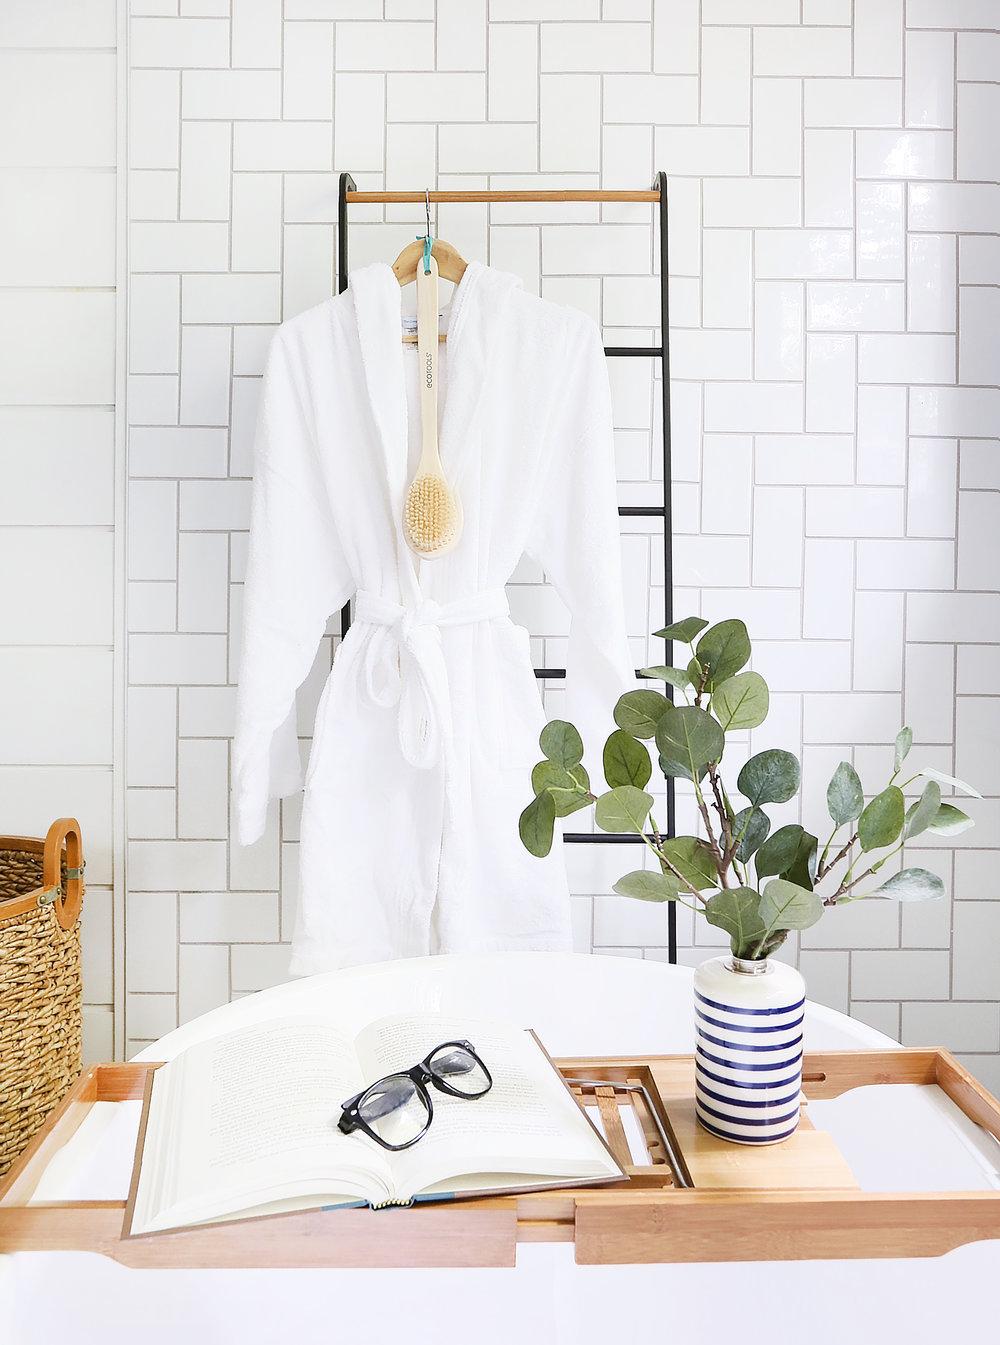 scs-company-store-bath-8.jpg